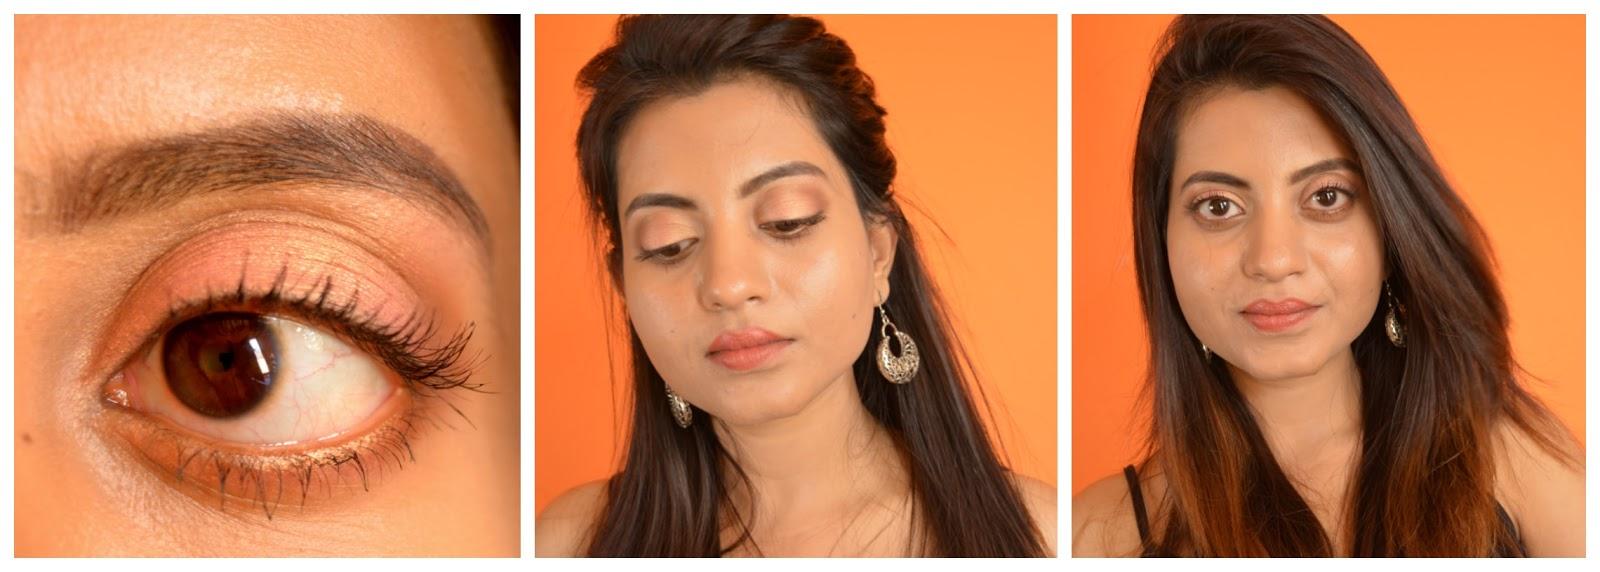 Makeup Revolution Ultra Brow Palette 'Medium to Dark' Review, Swatch, FOTD